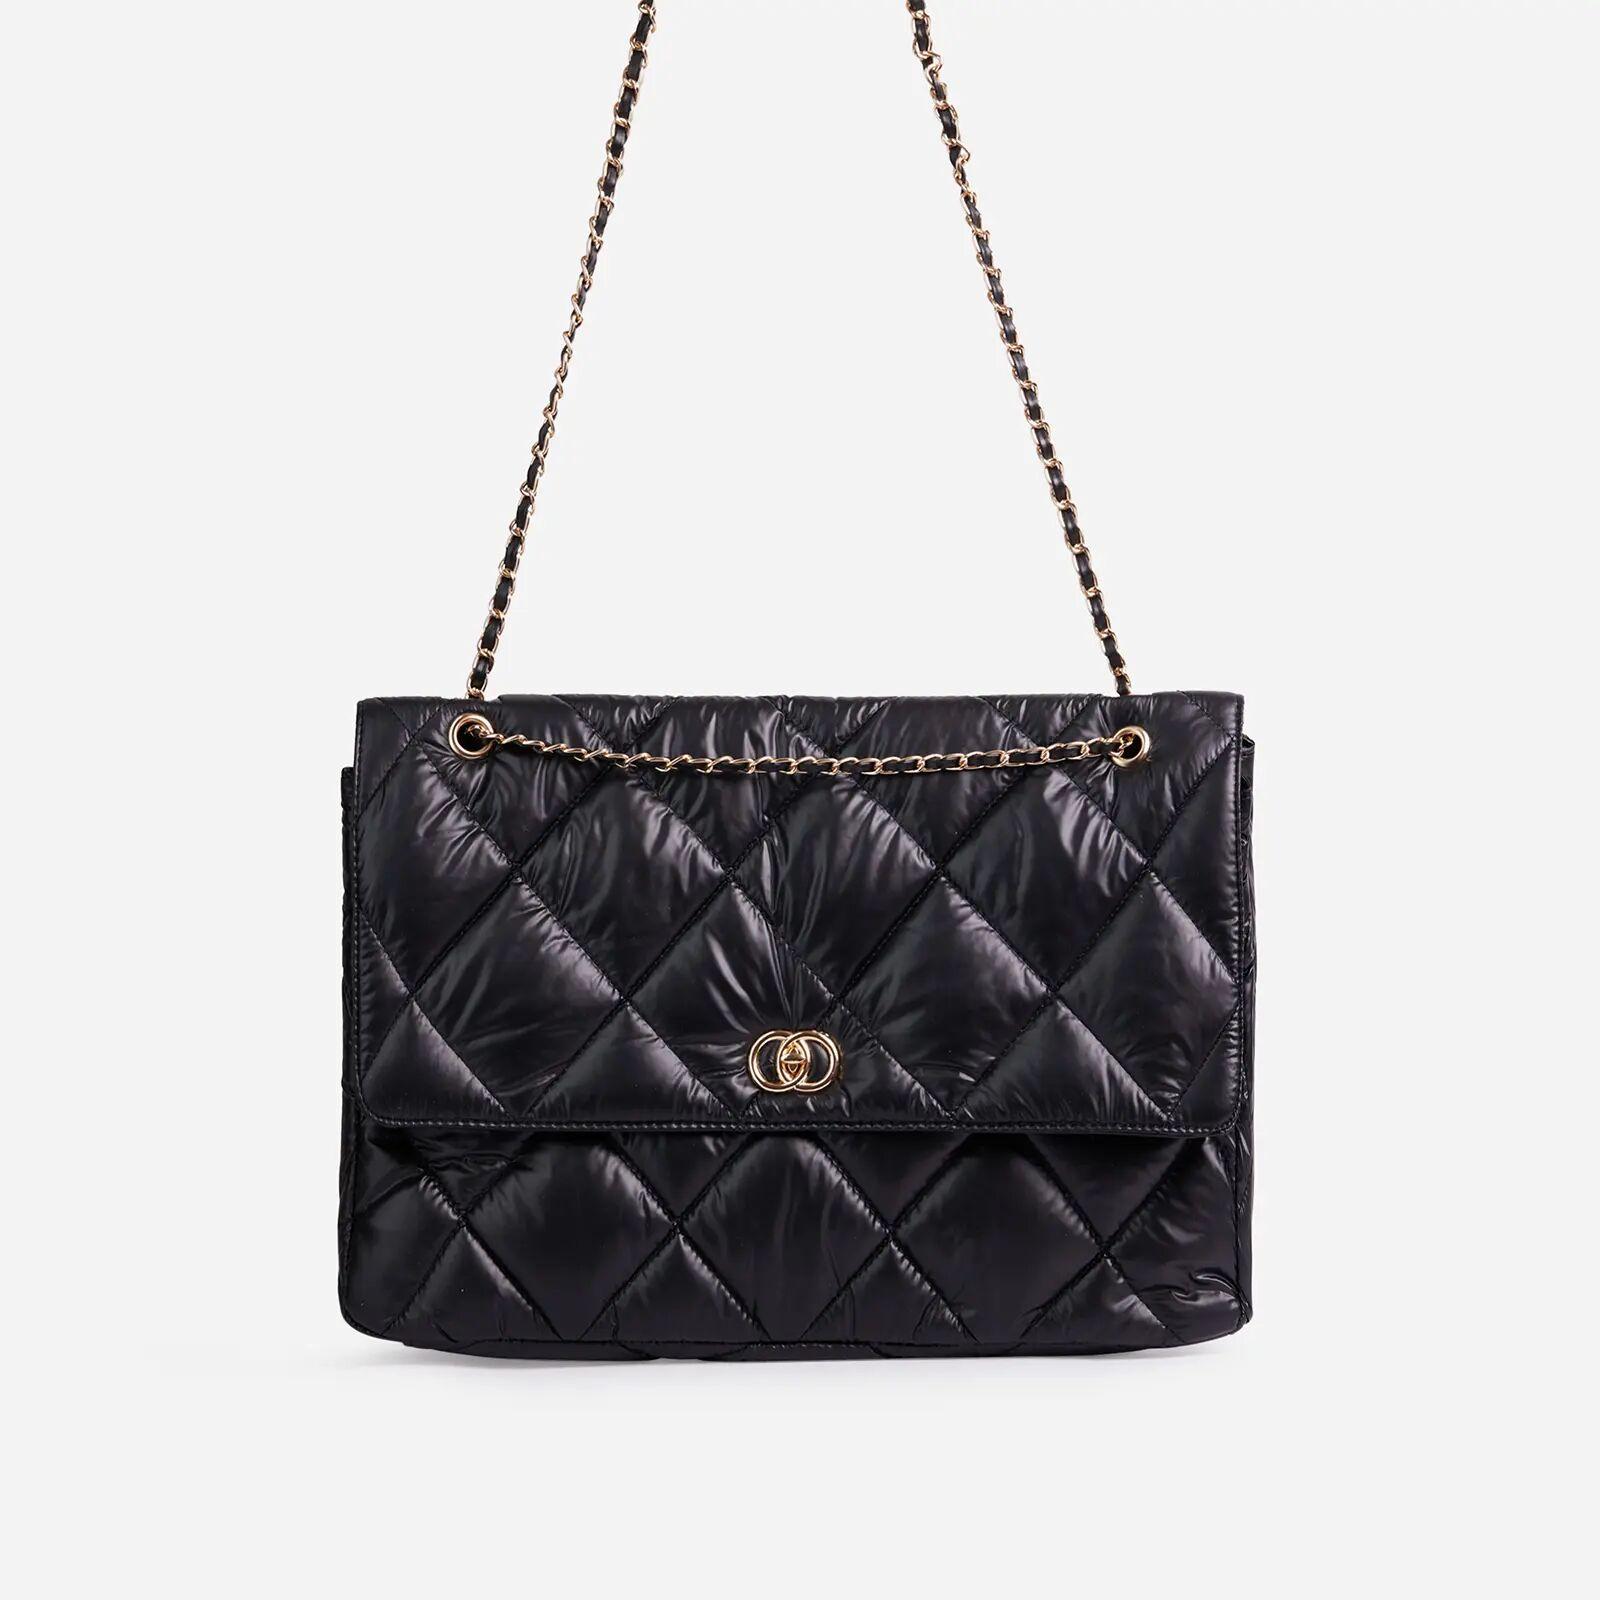 EGO Aloe Oversized Quilted Puffa Shoulder Bag In Black Nylon,, Black  - female - Size: One Size